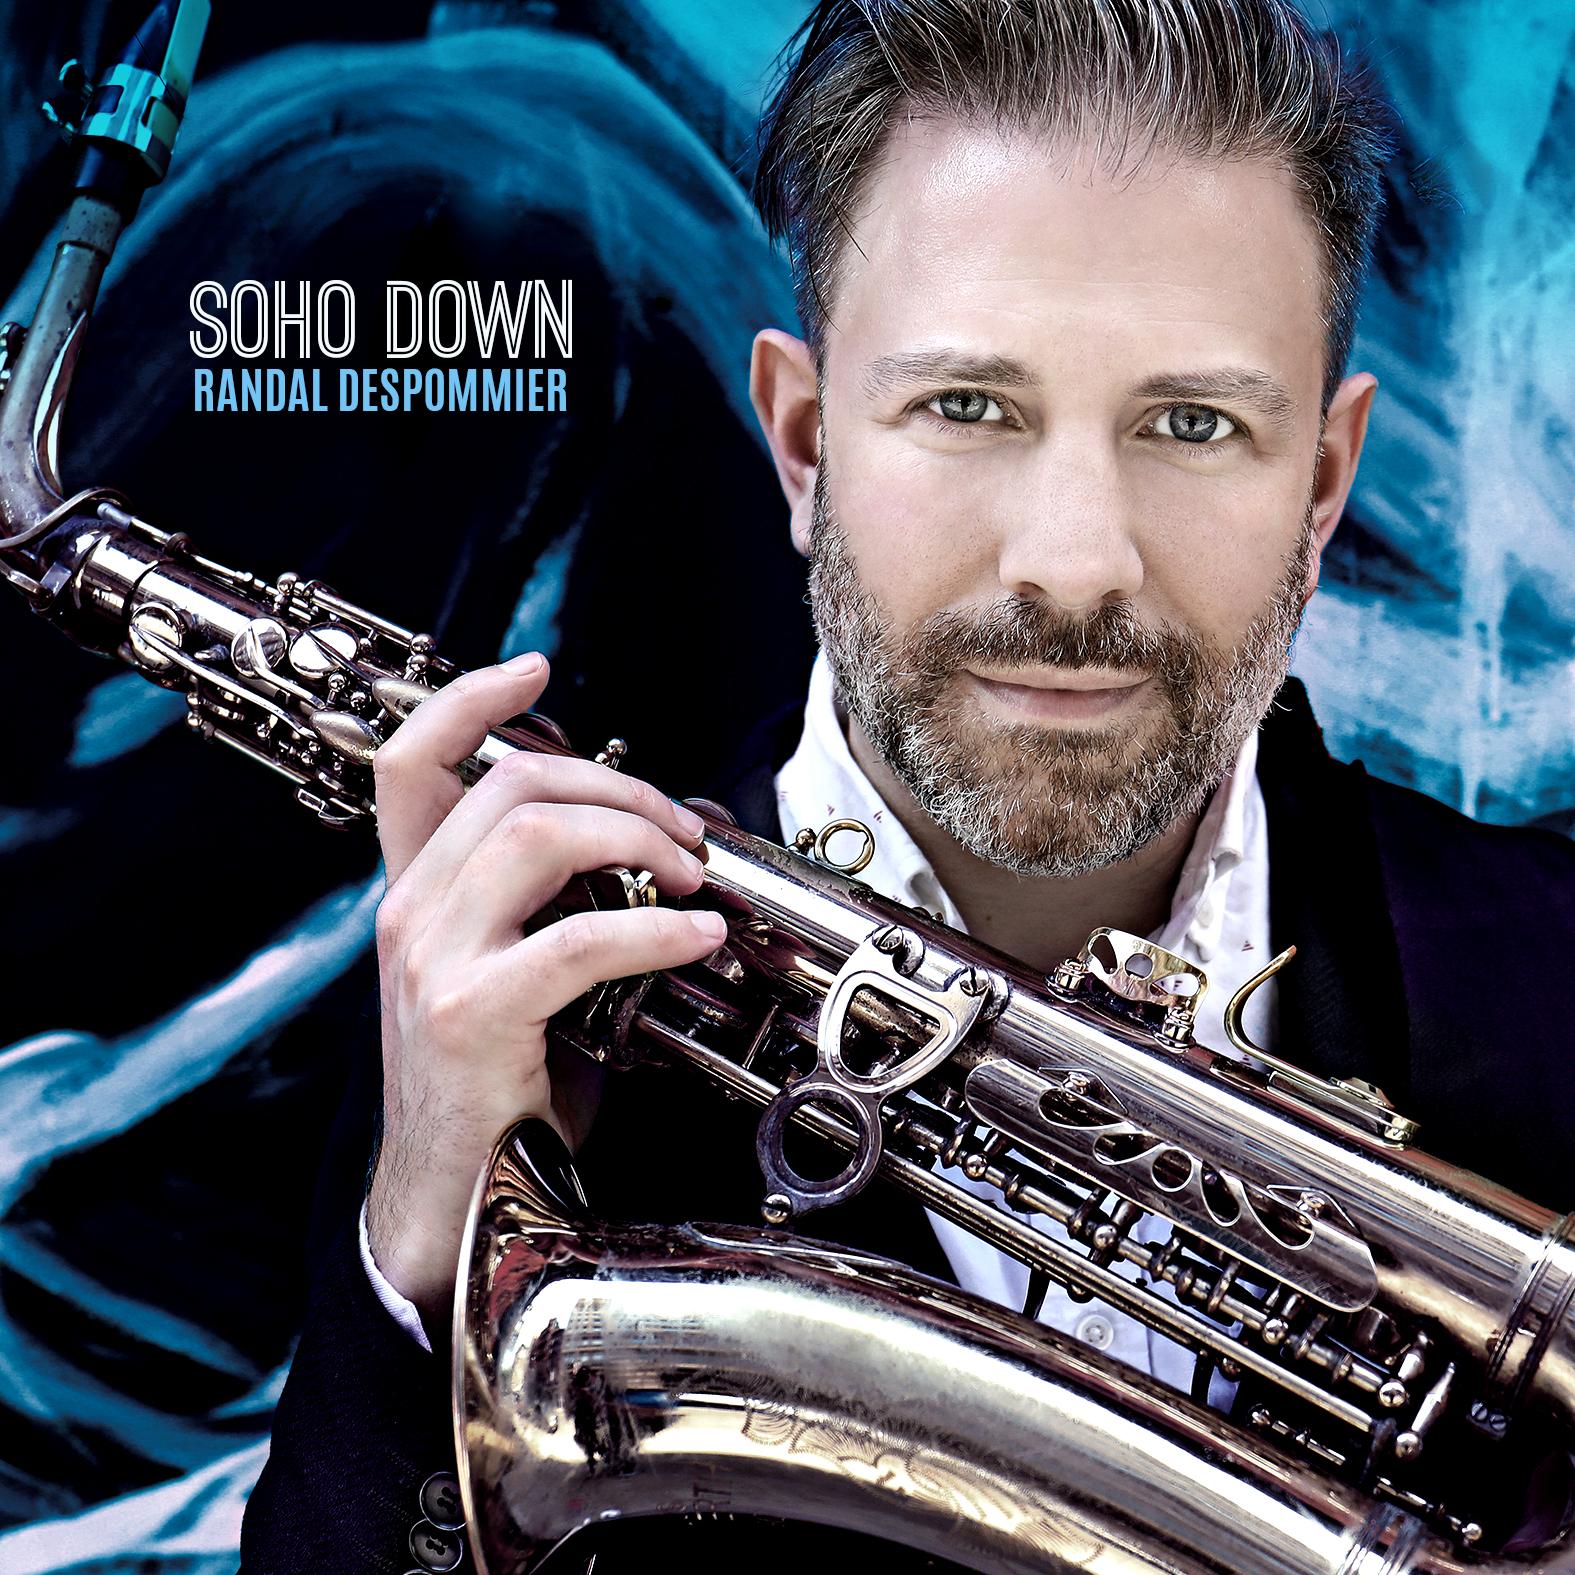 SoHo Down Image